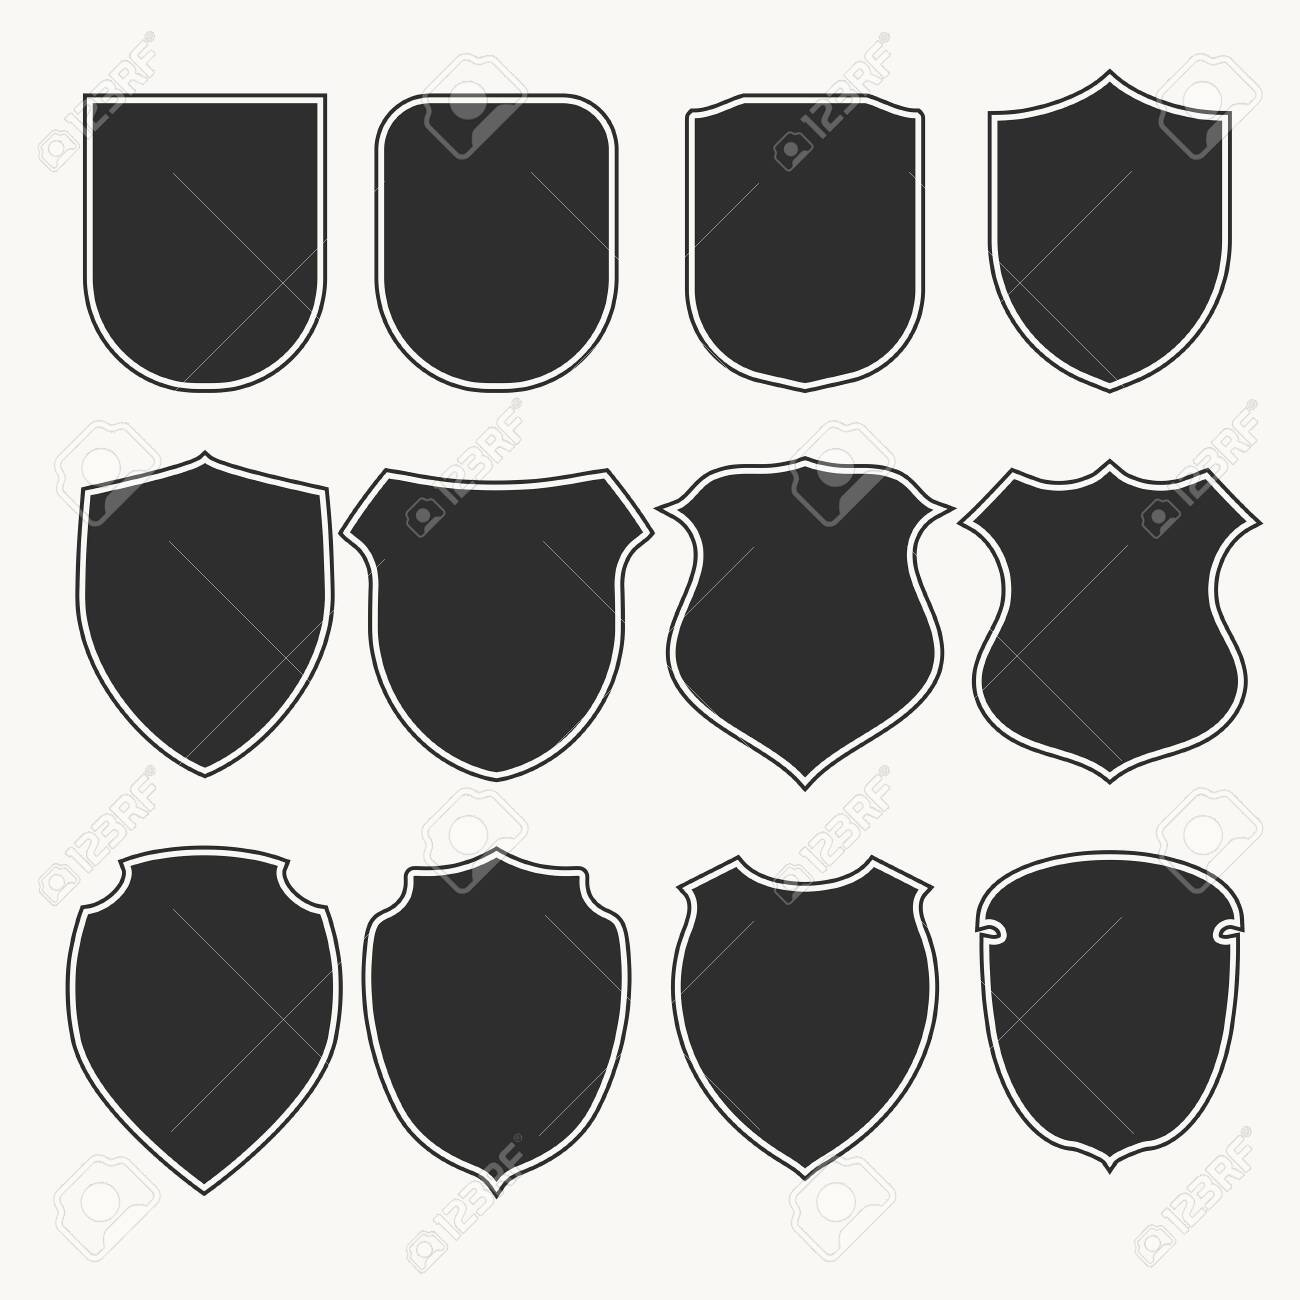 Heraldic shields icons set silhouettes. Vector illustration - 124278968